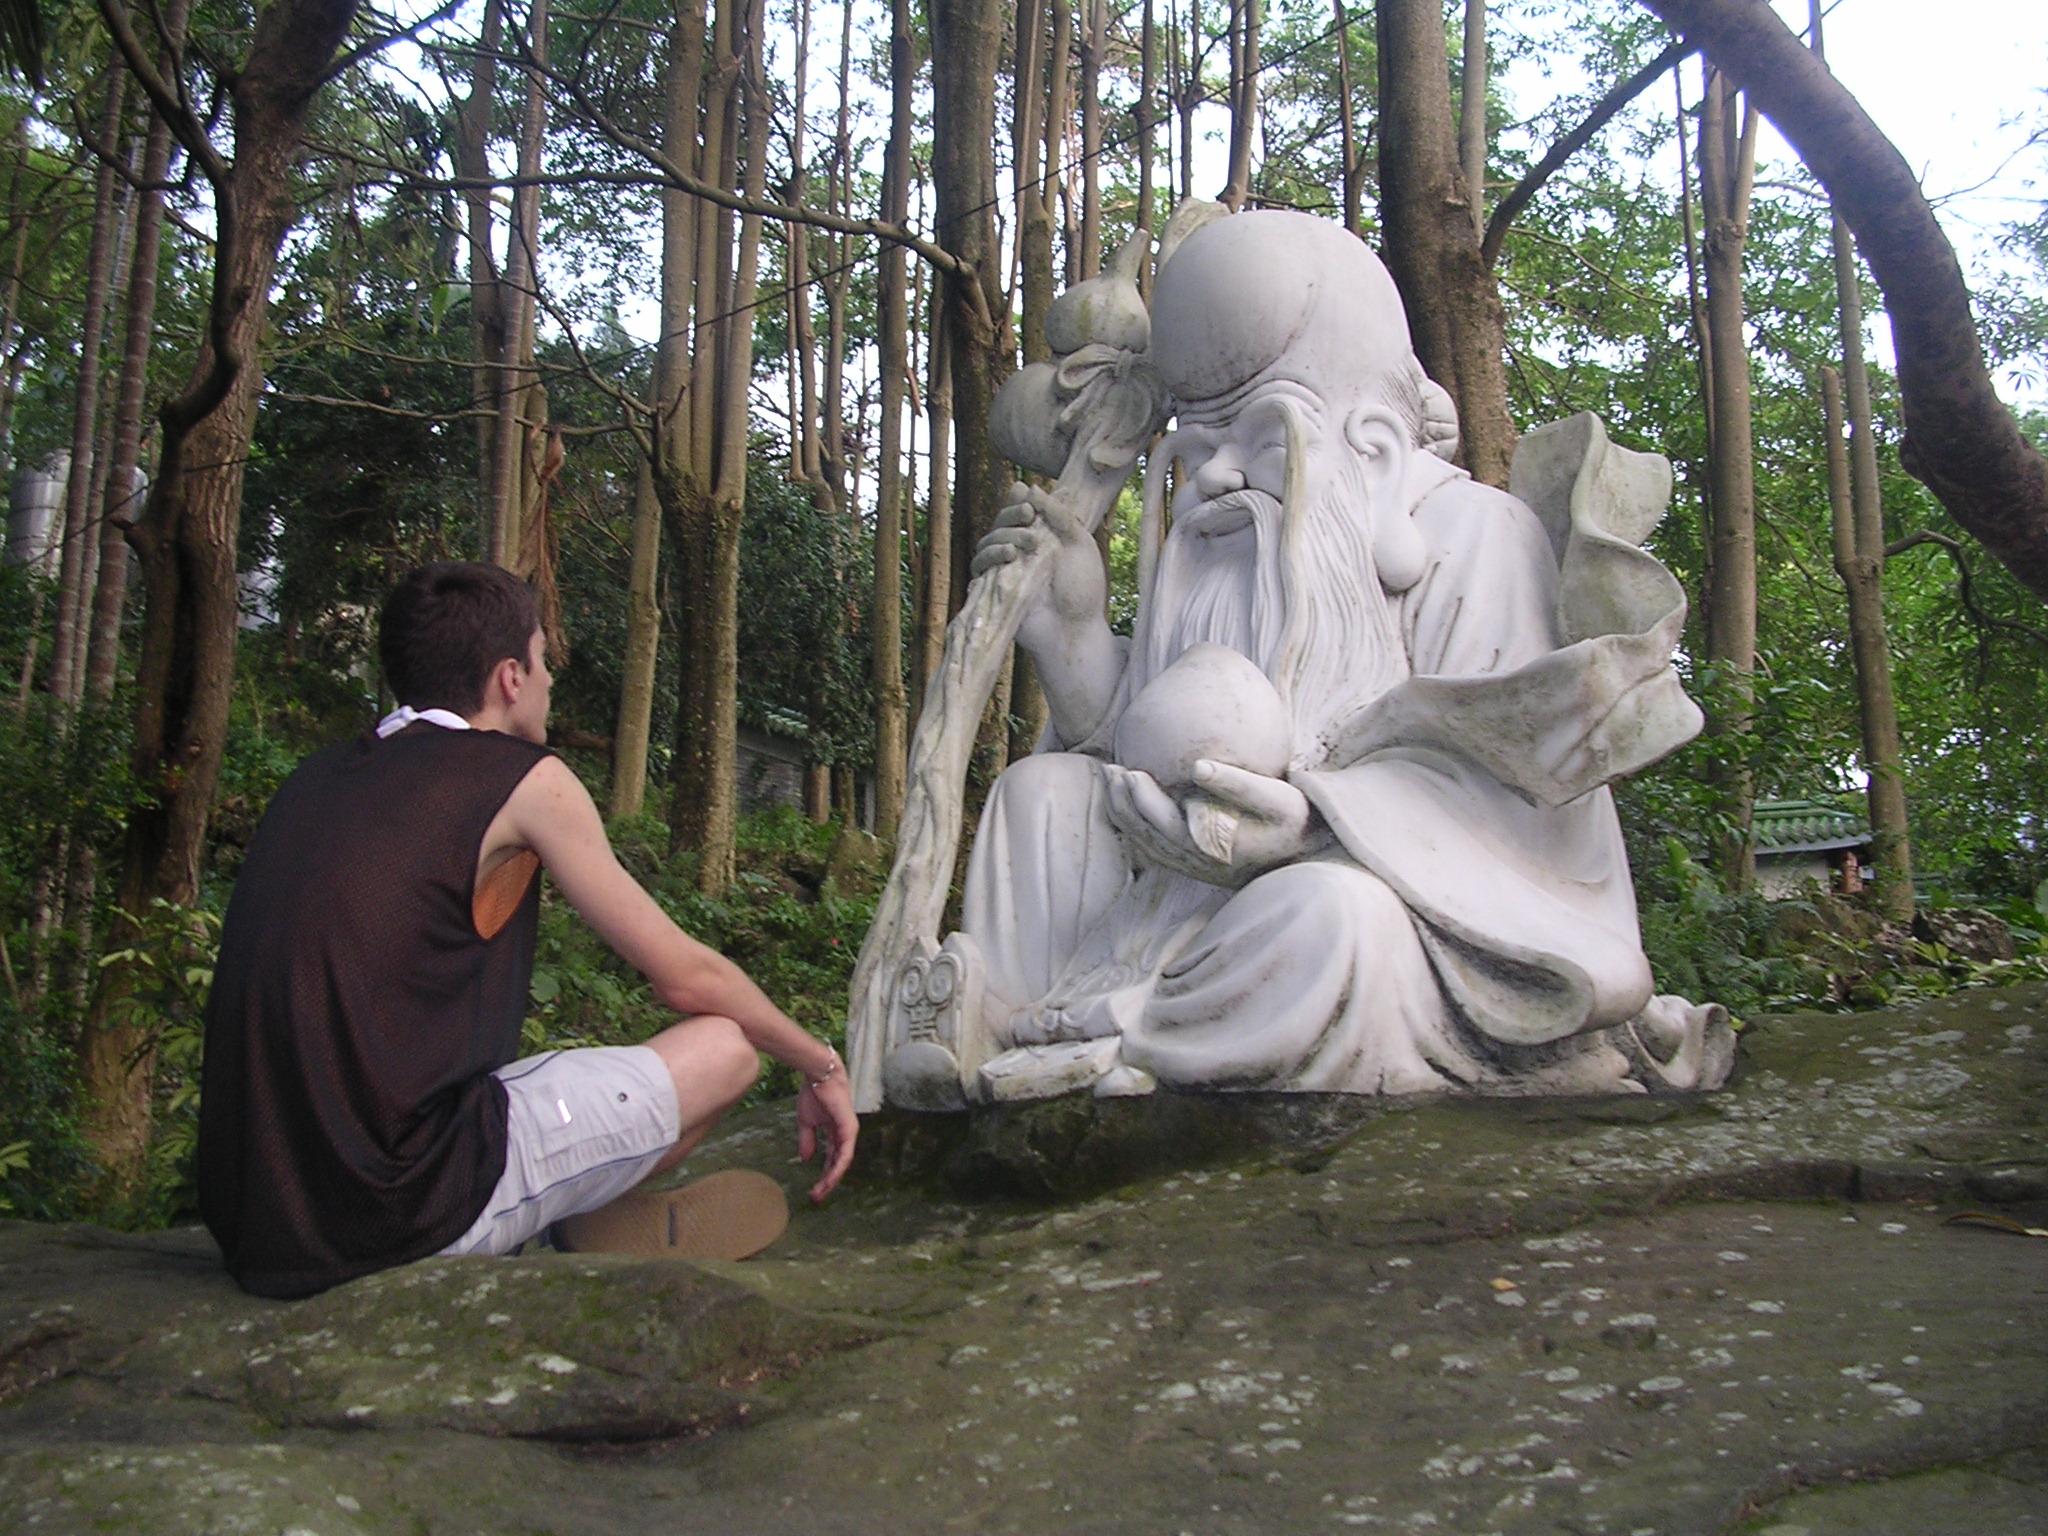 FileTaiwanese Temple Near Taizhong Meditation With Statue